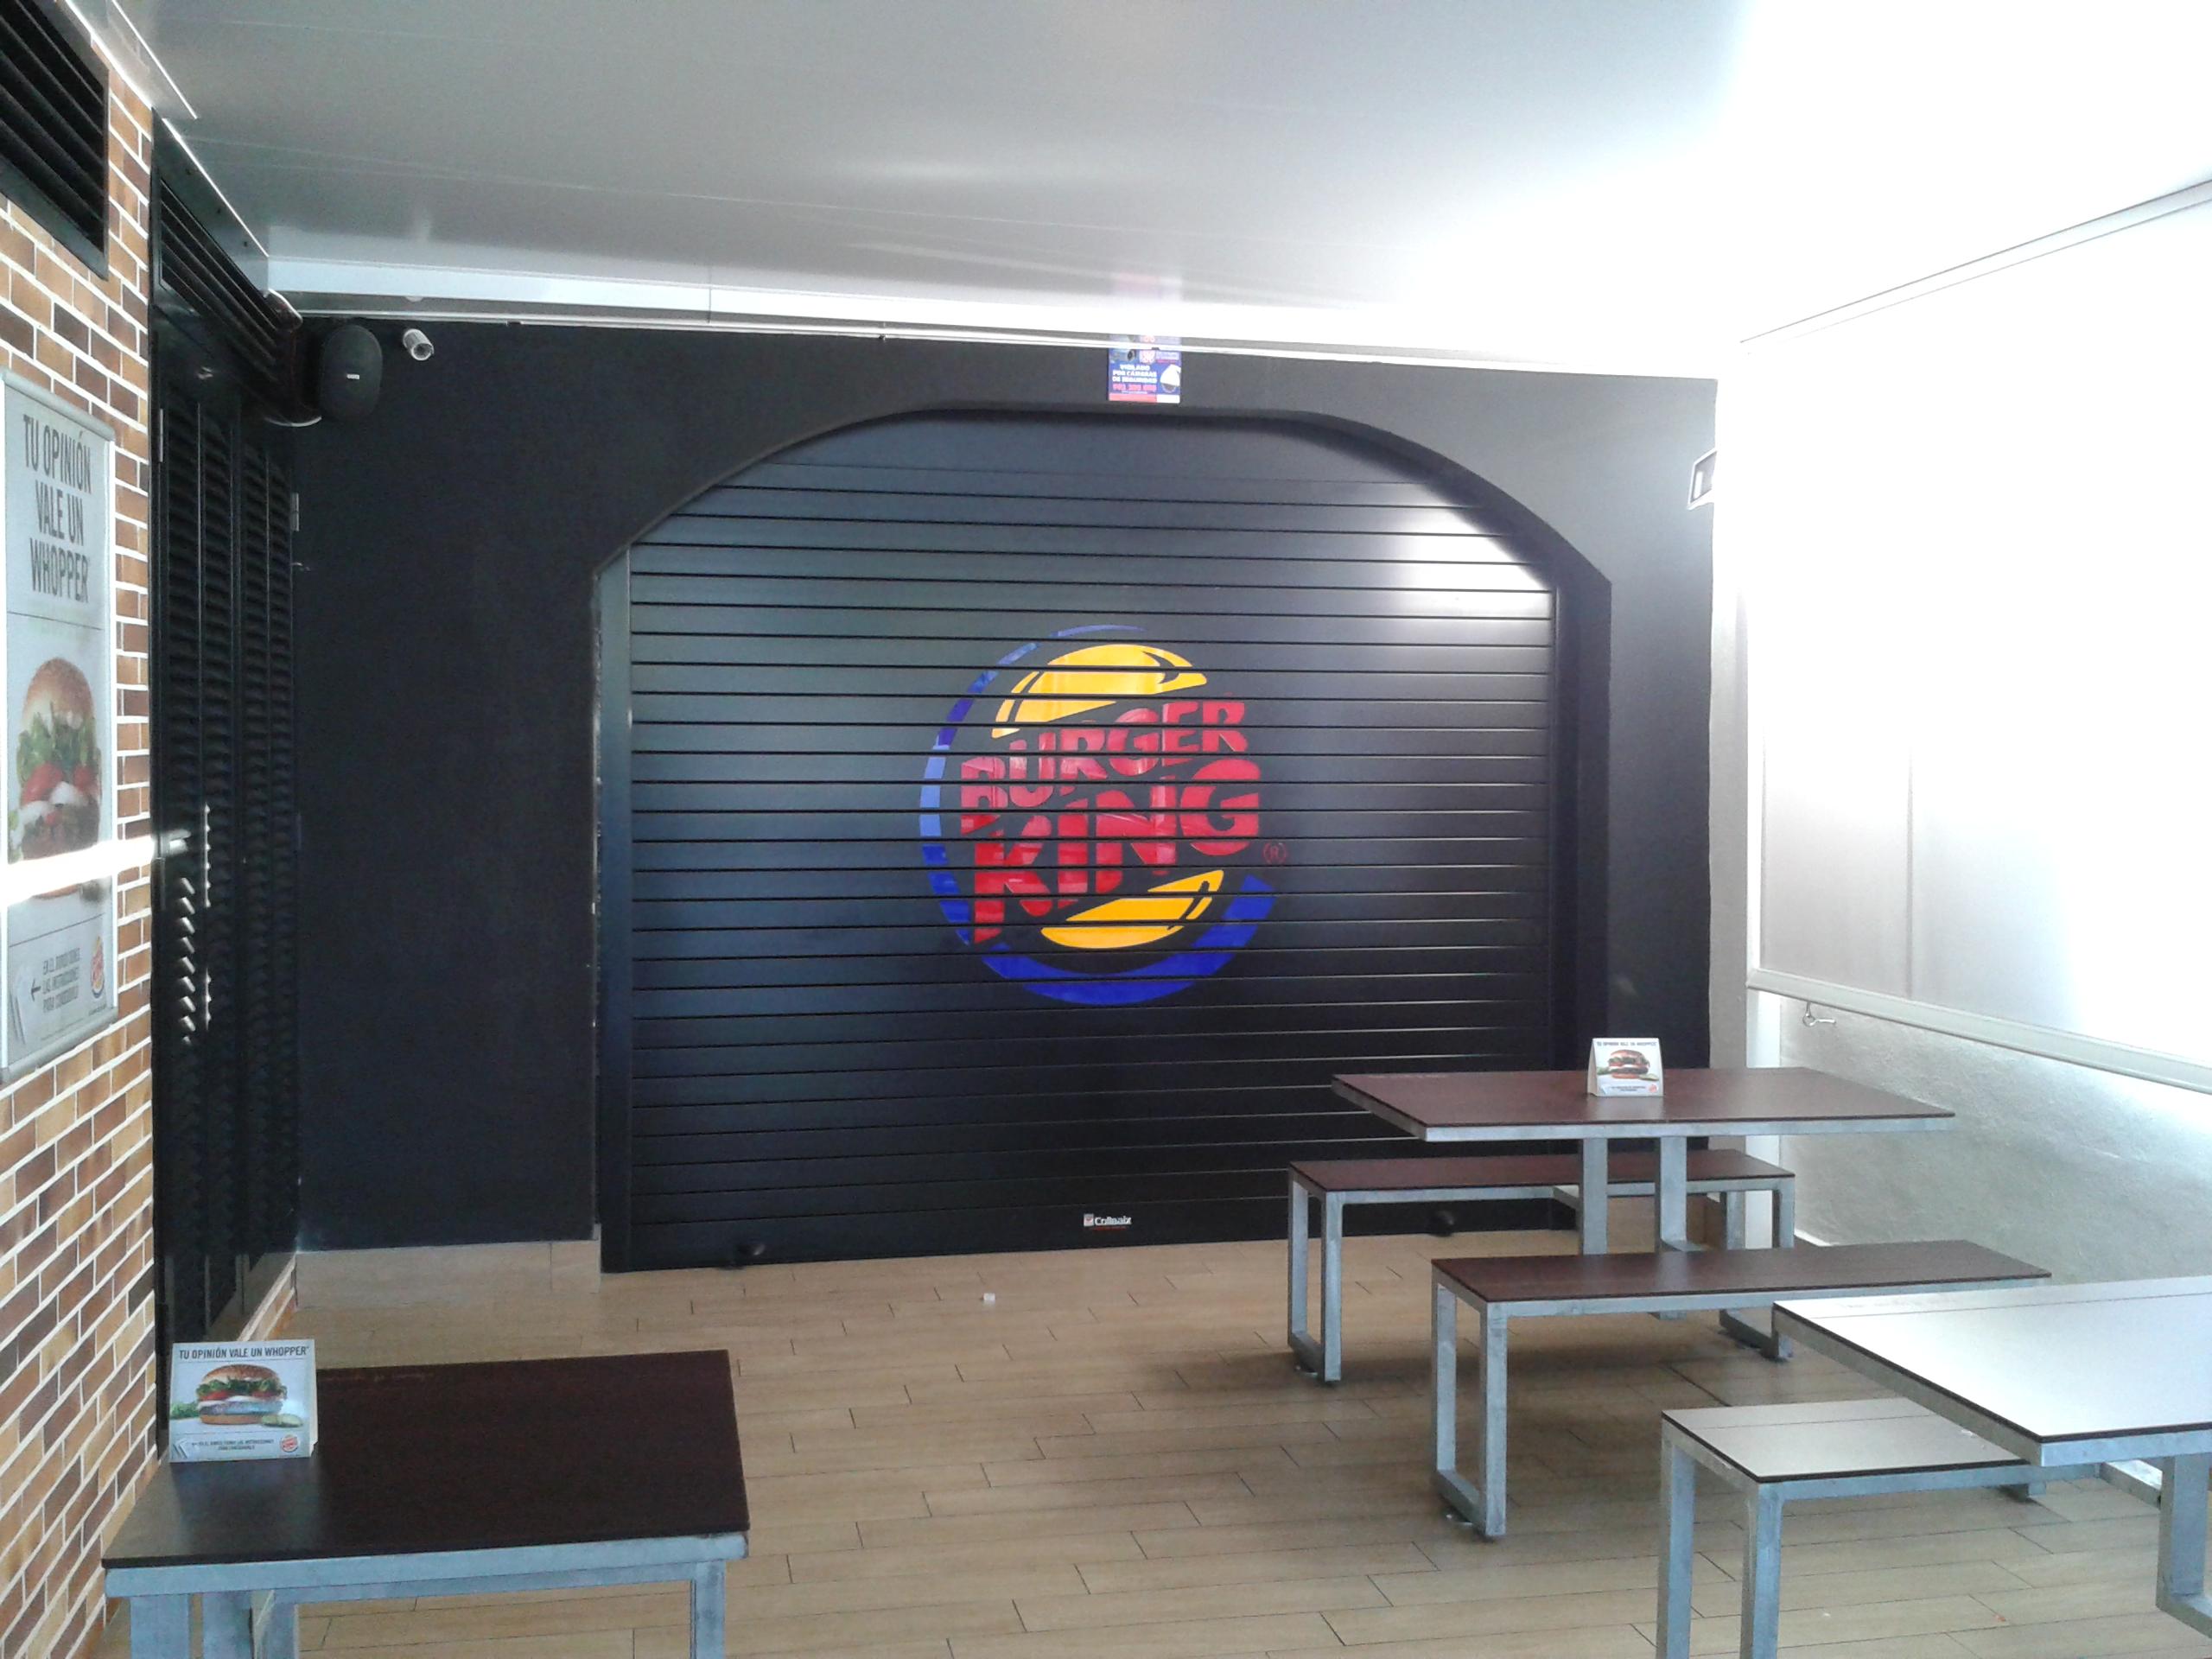 CollBaix Burger King 4.jpg